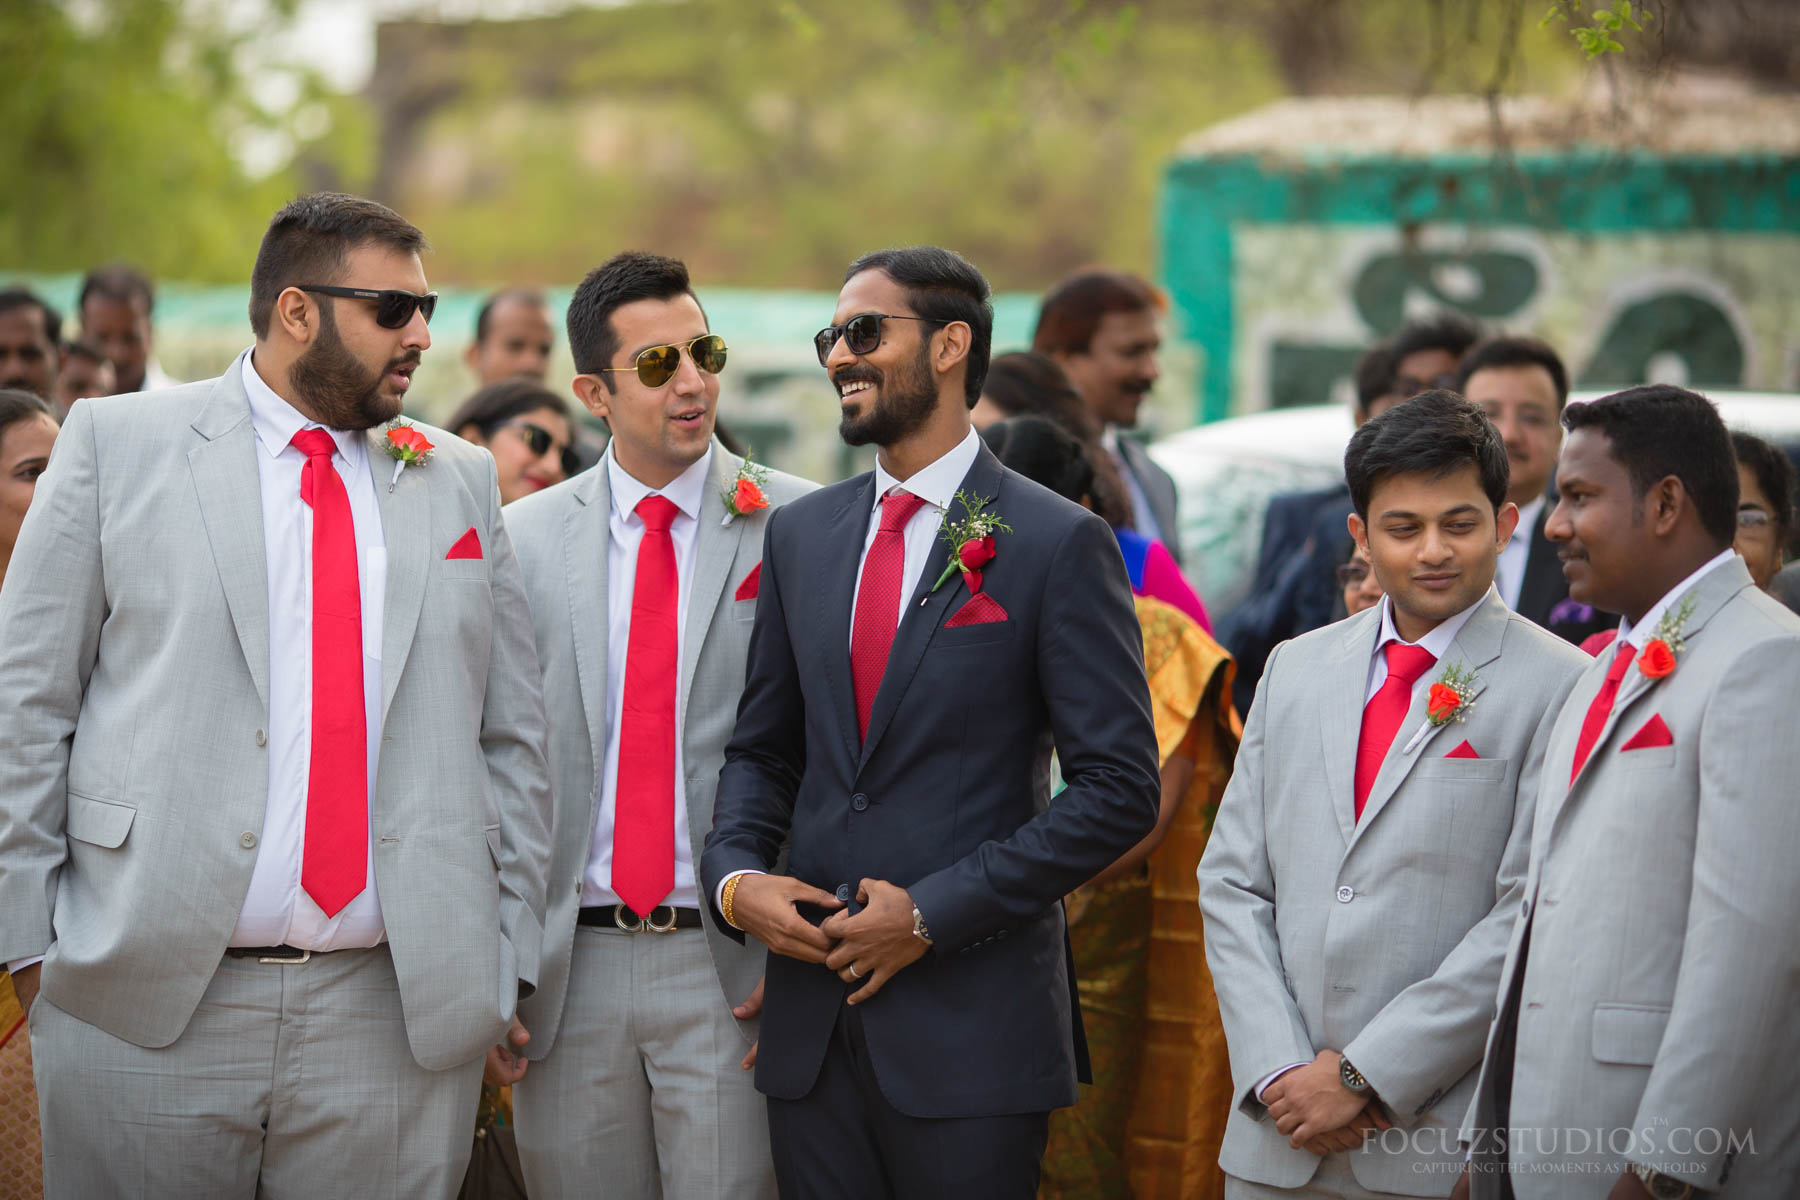 Best Christian Wedding Photography in Tamil Nadu